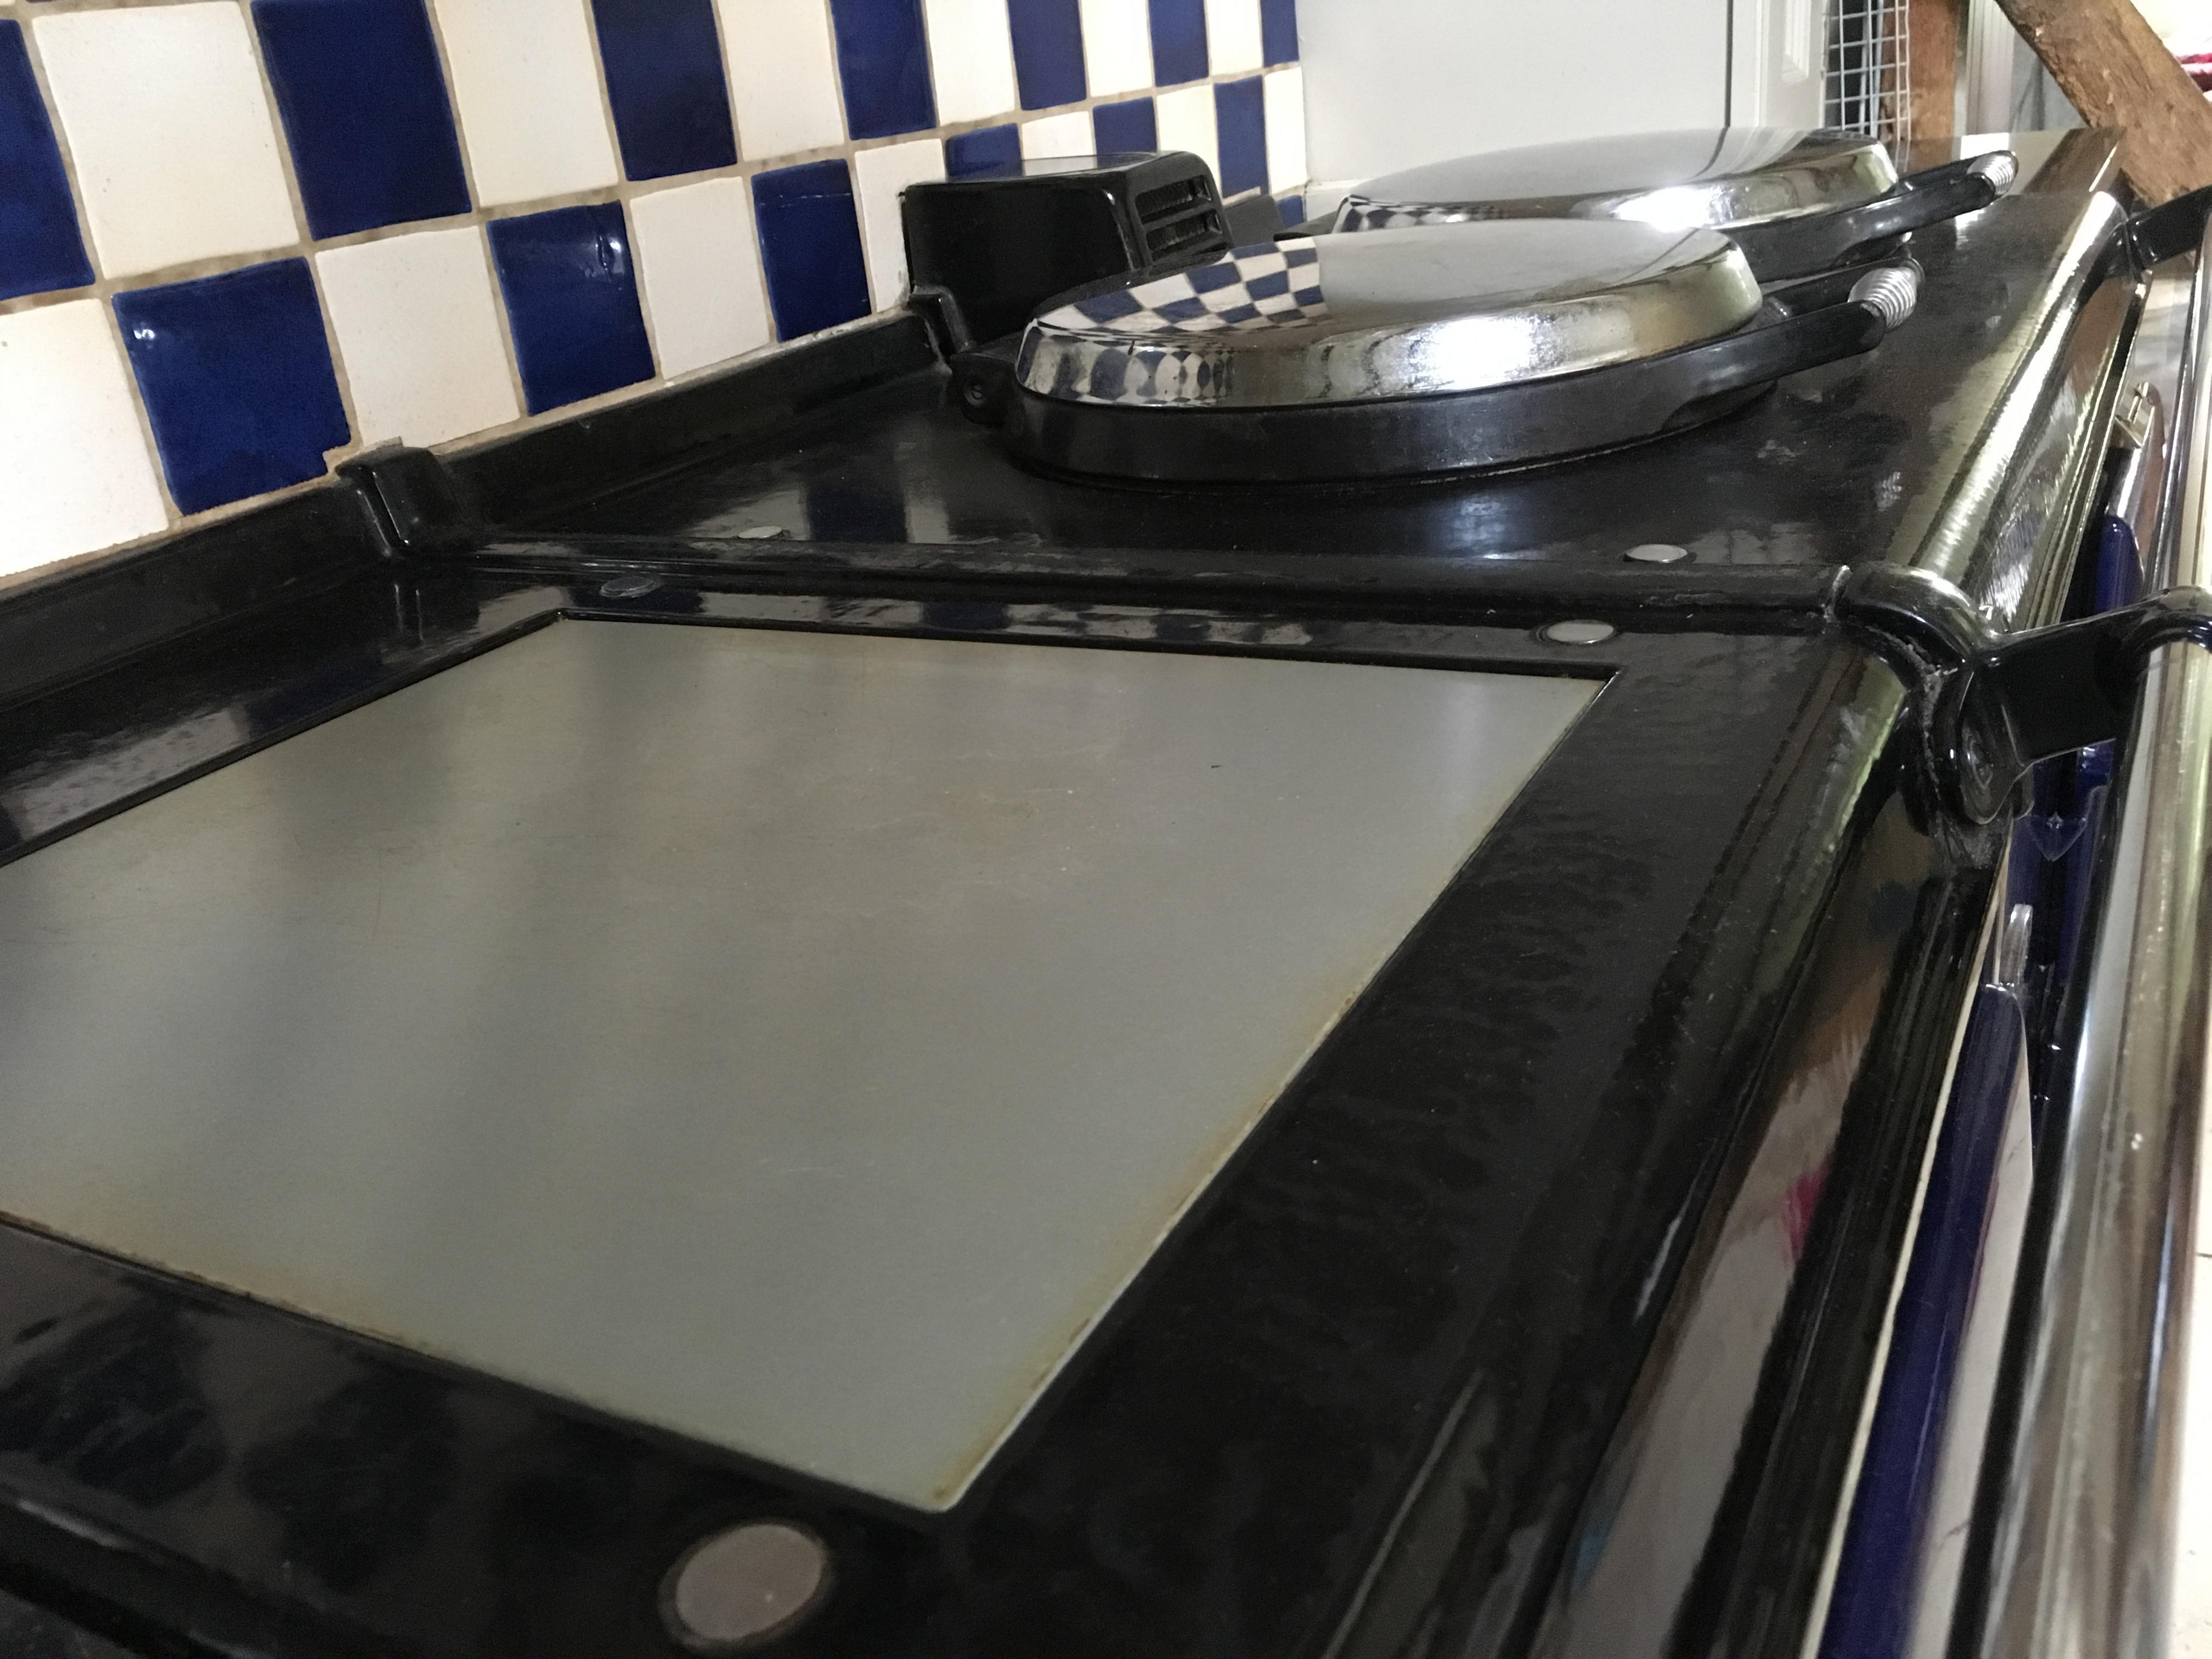 Beautiful 4 oven gas AGA